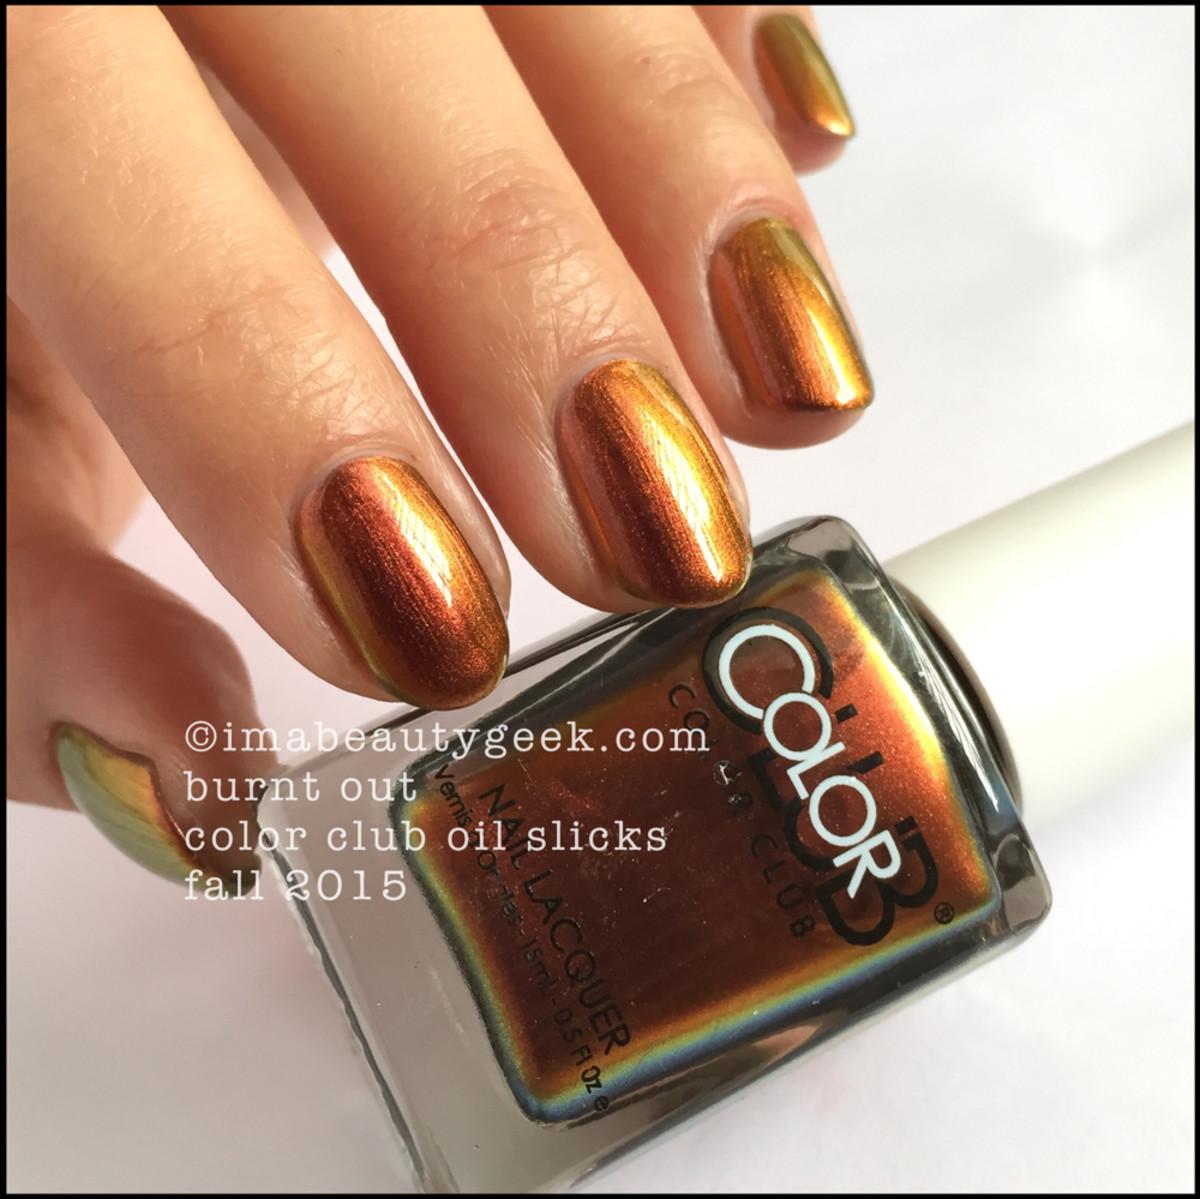 Color Club Oil Slicks_Color Club Burnt Out_1